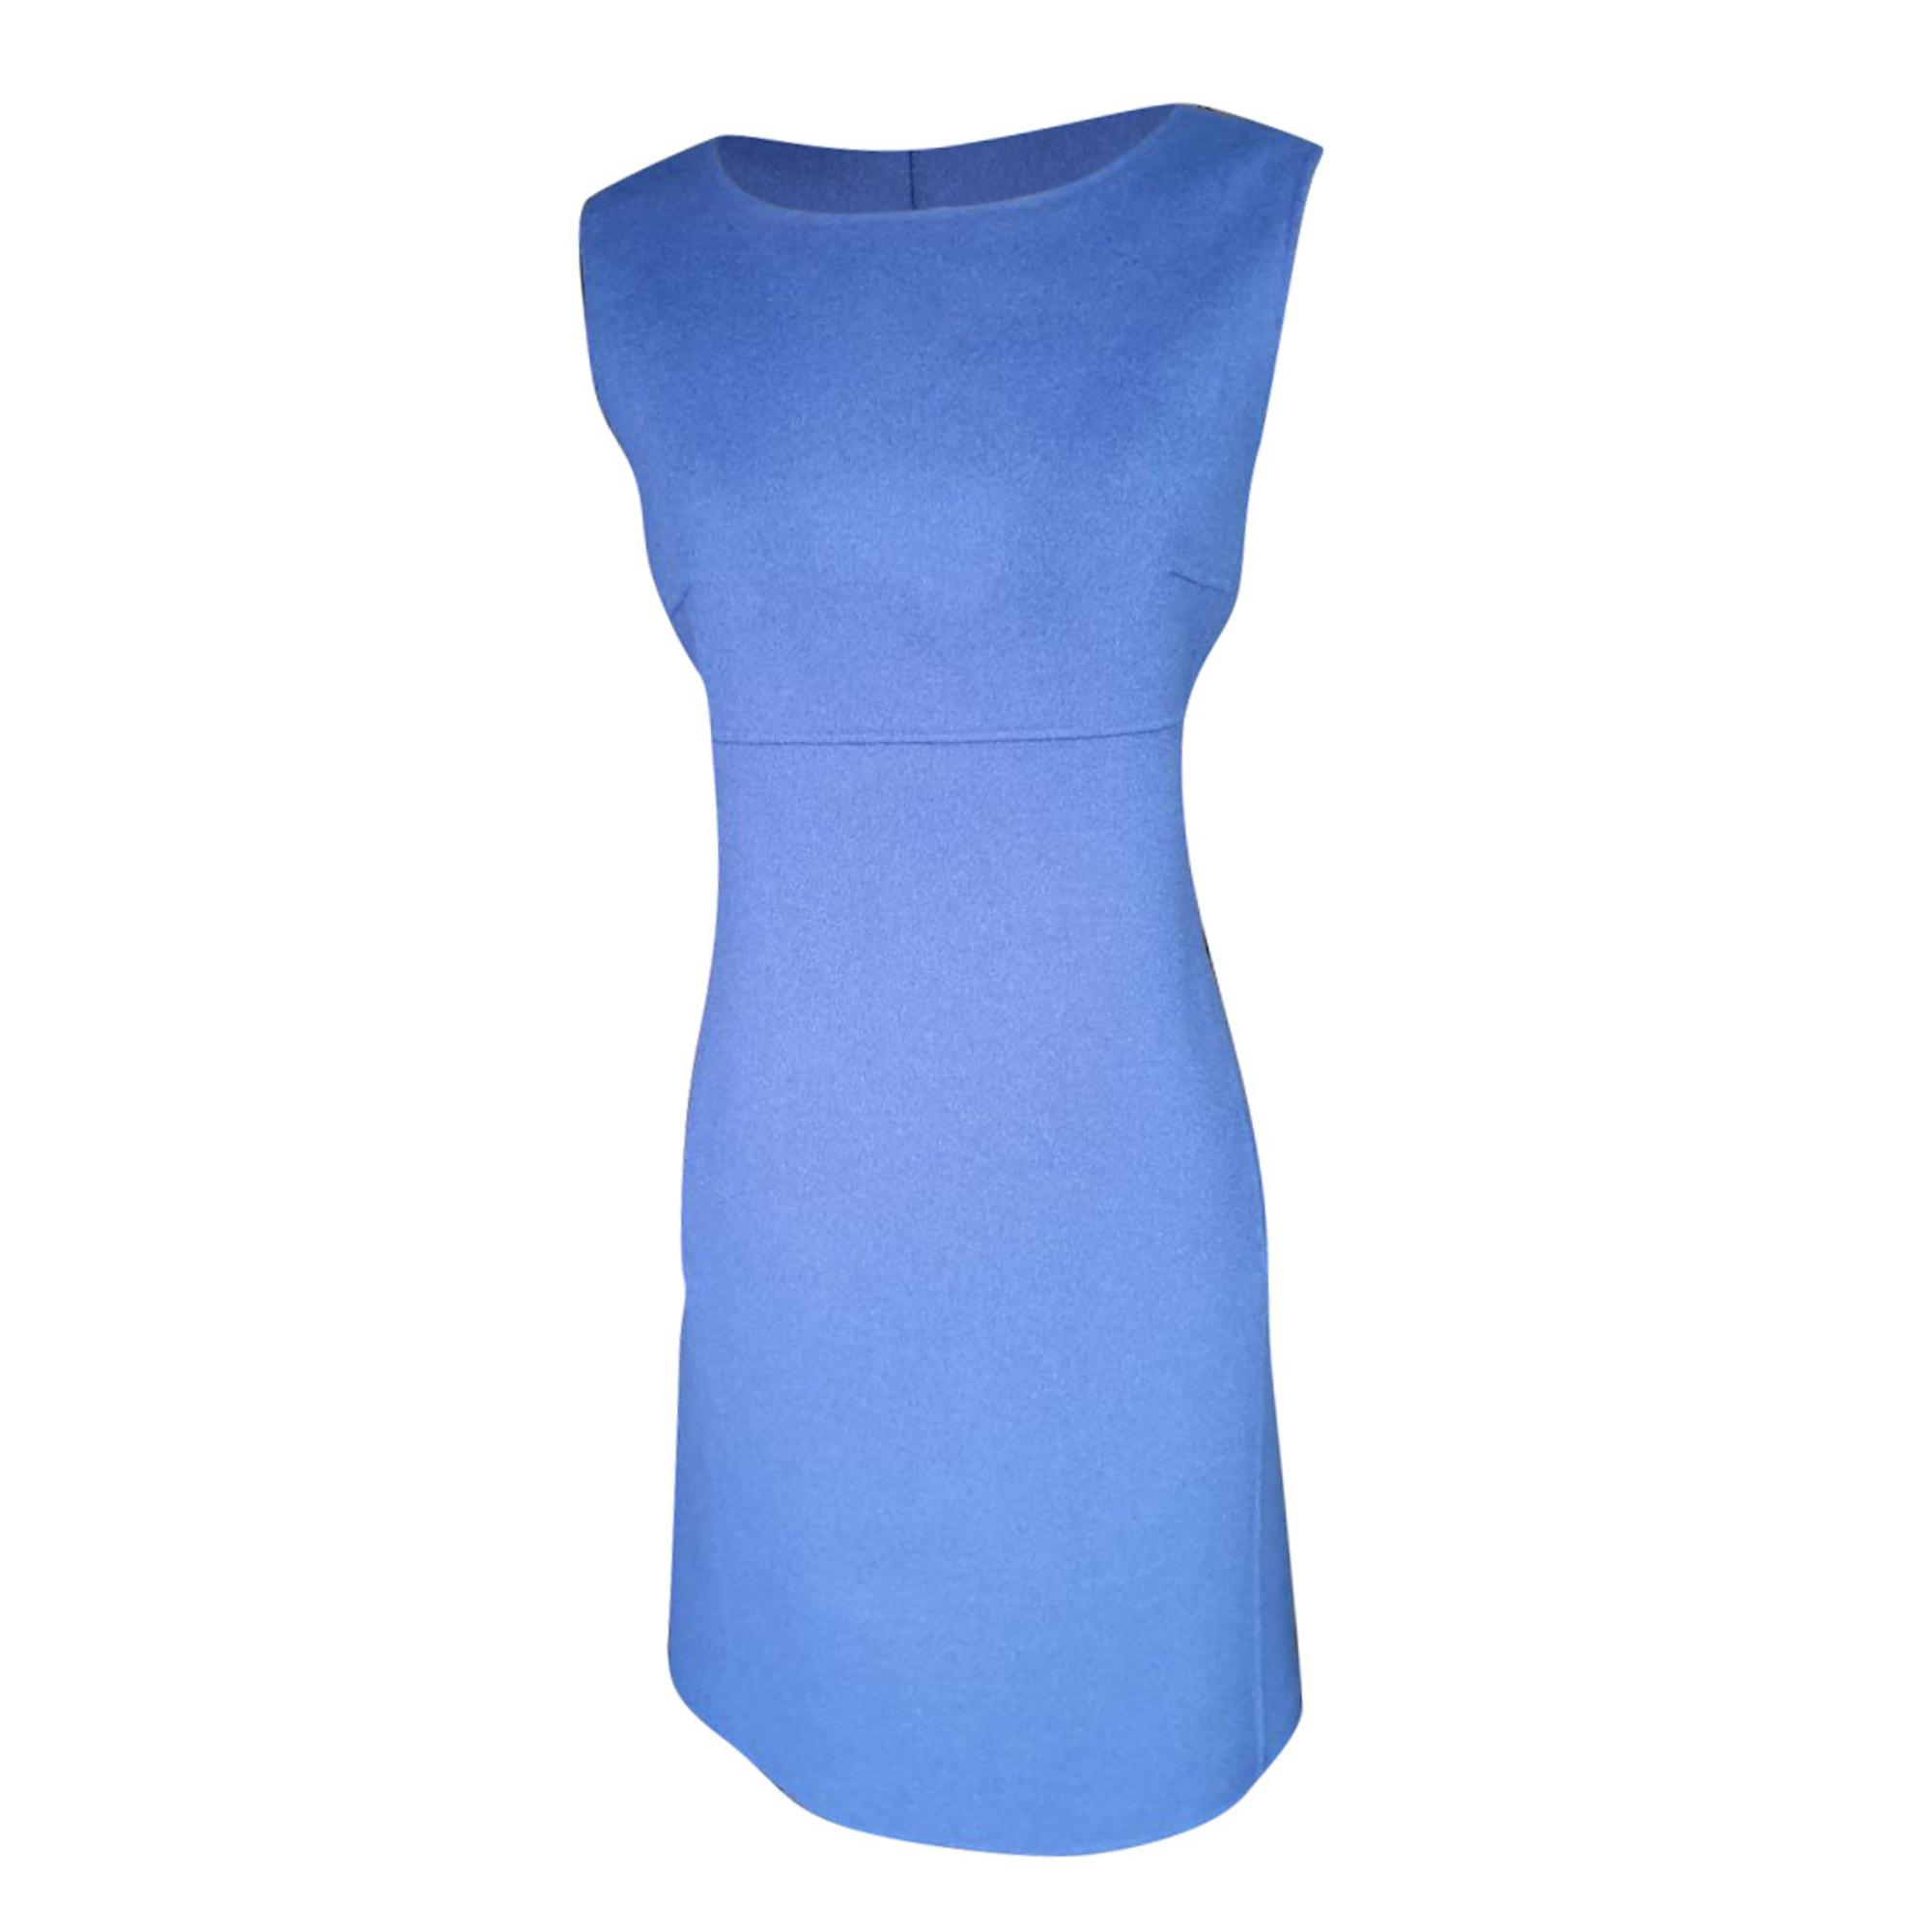 Robe mi-longue WEEKEND MAX MARA Bleu, bleu marine, bleu turquoise